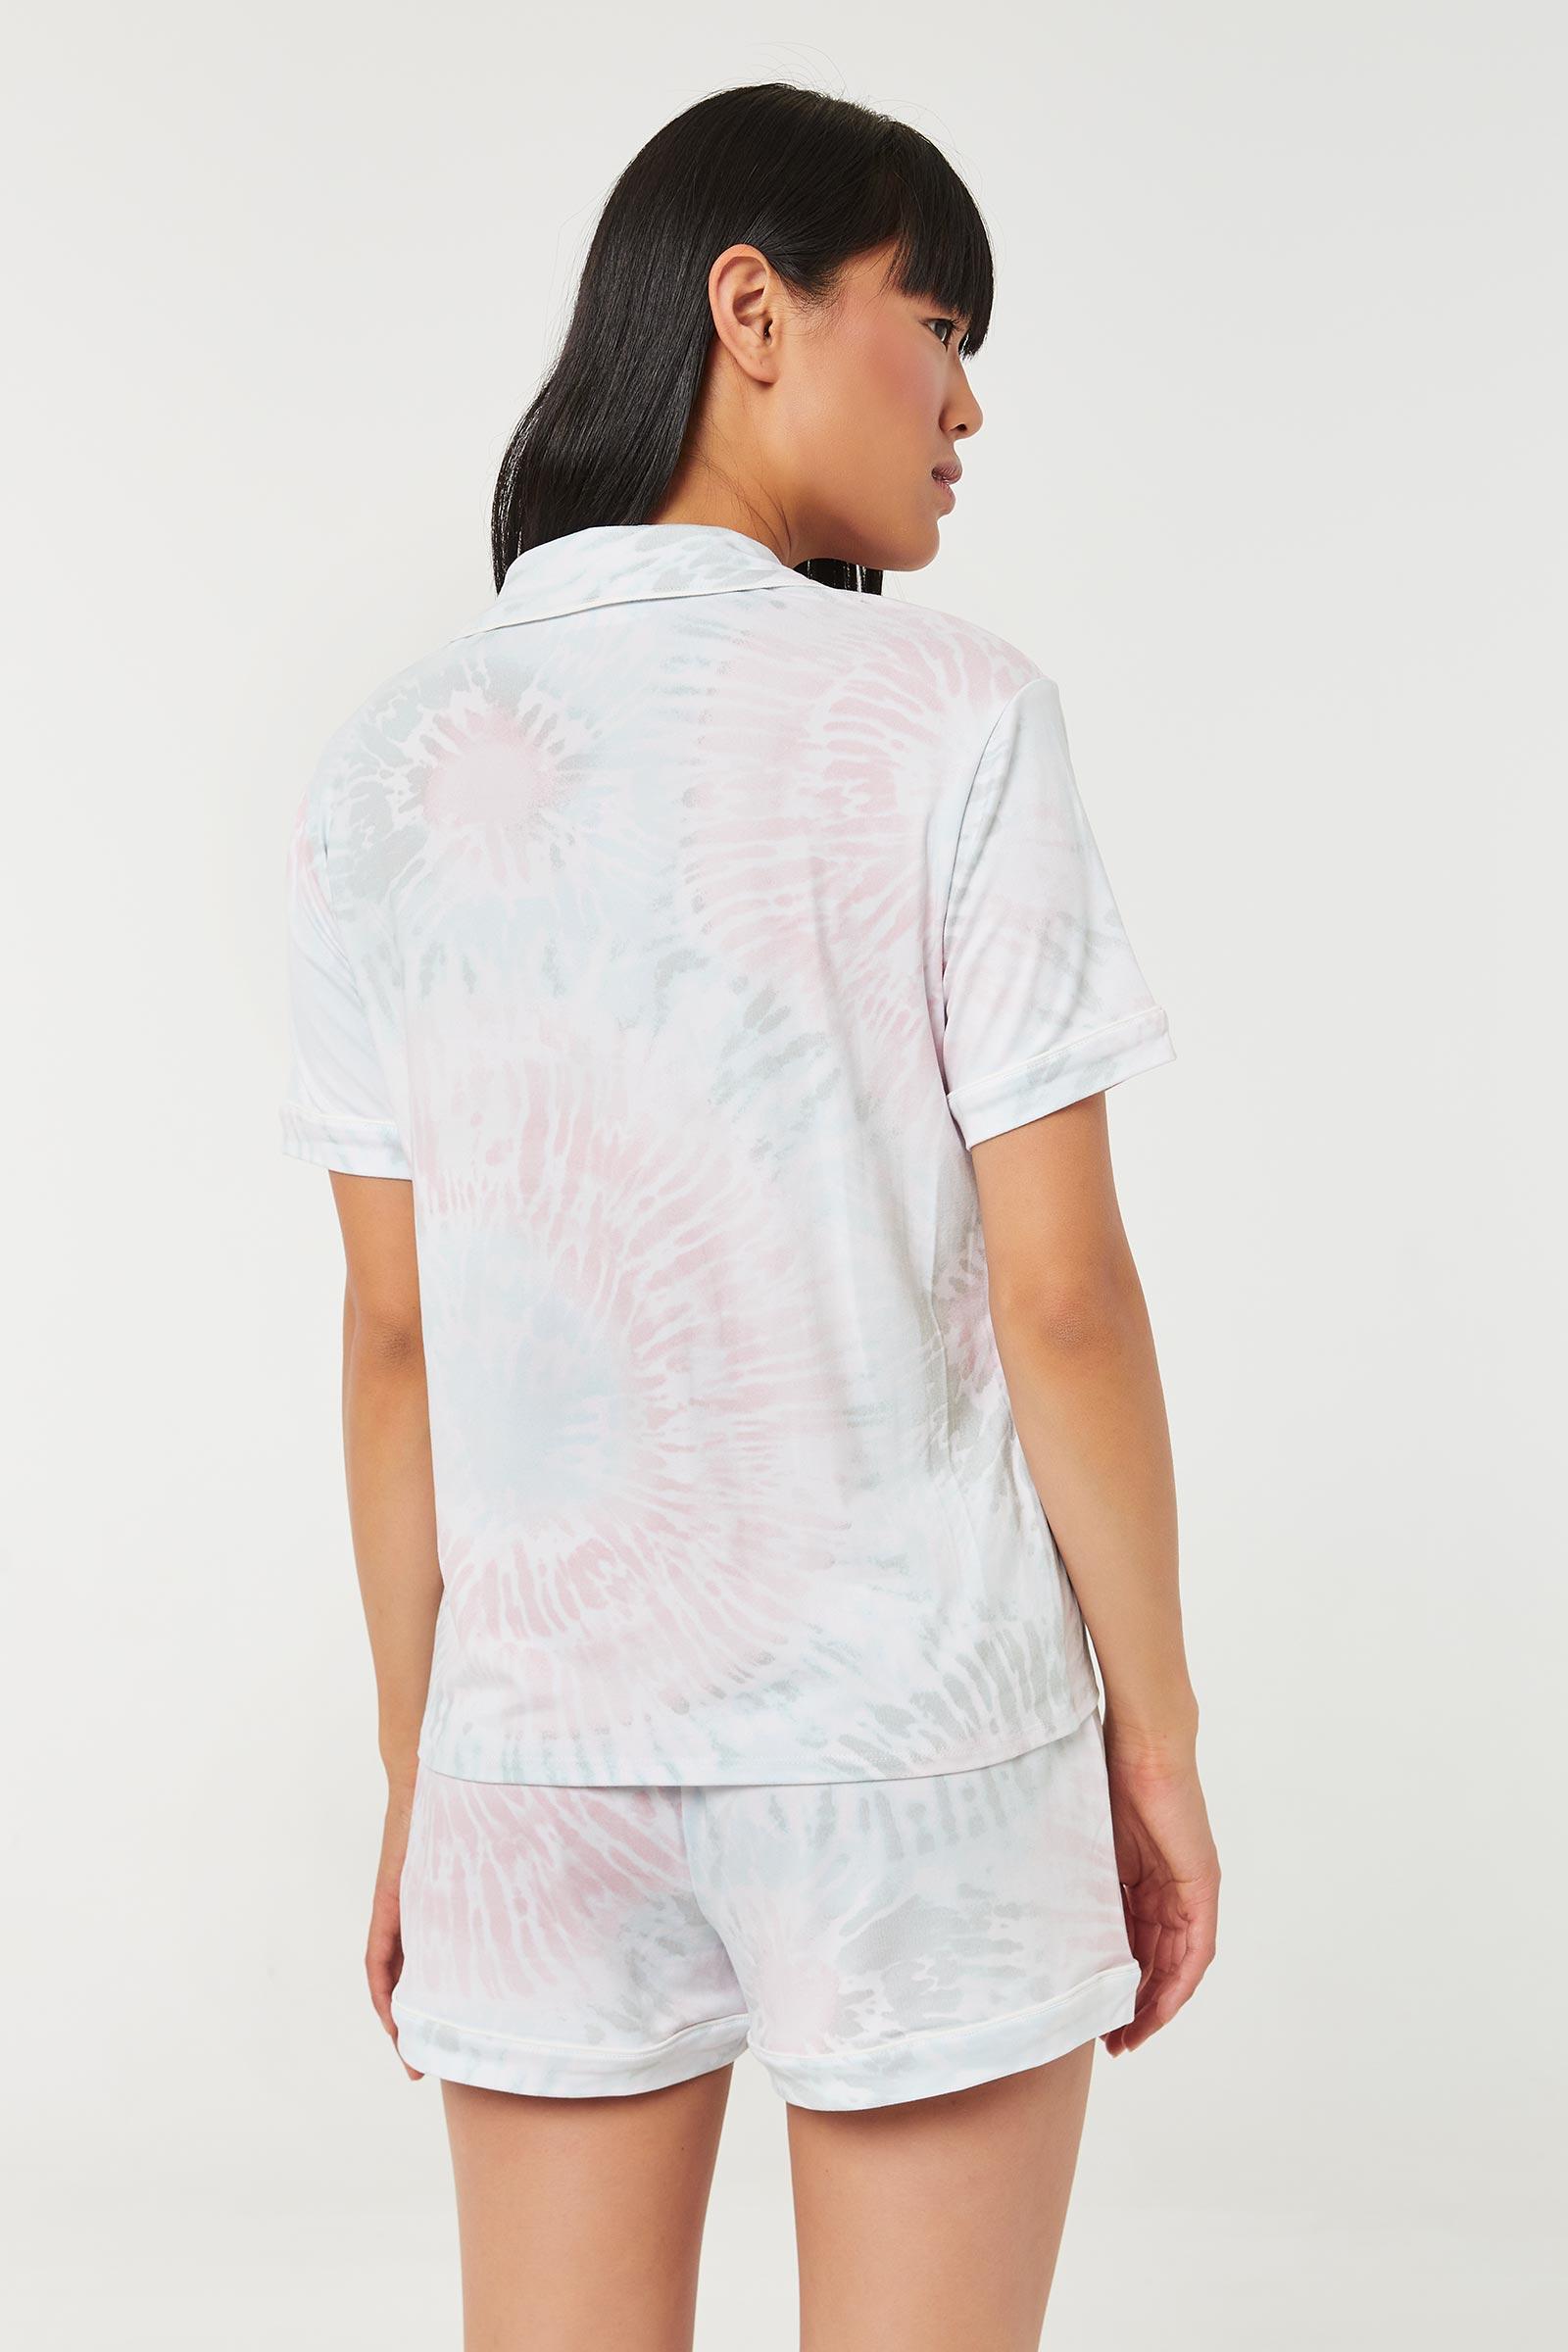 Tie-Dye PJ Set with Contrast Binding